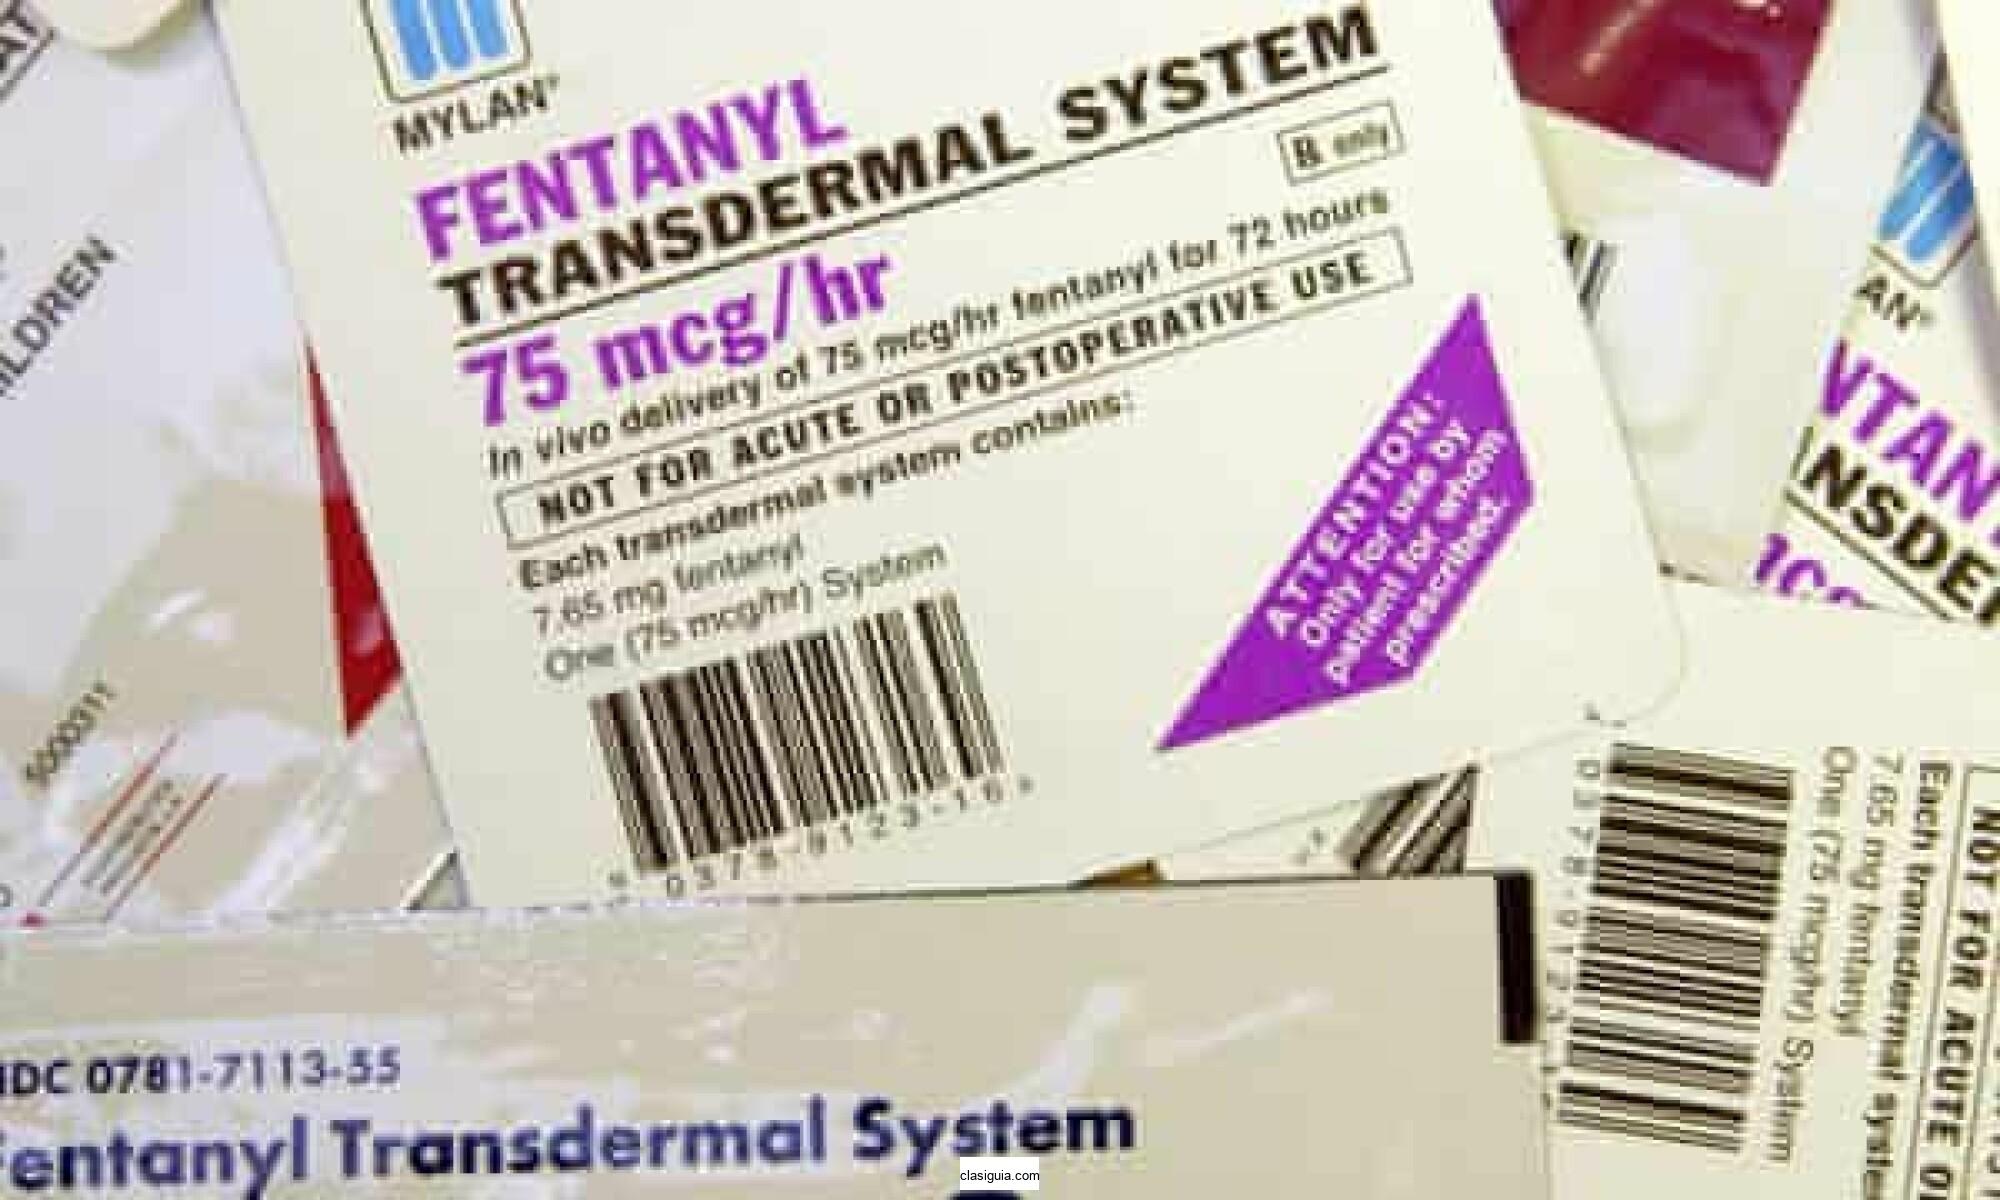 Koupit Fentanyl online (Koupit Fentanyl Pain Killer online) Koupit fentanylové náplasti